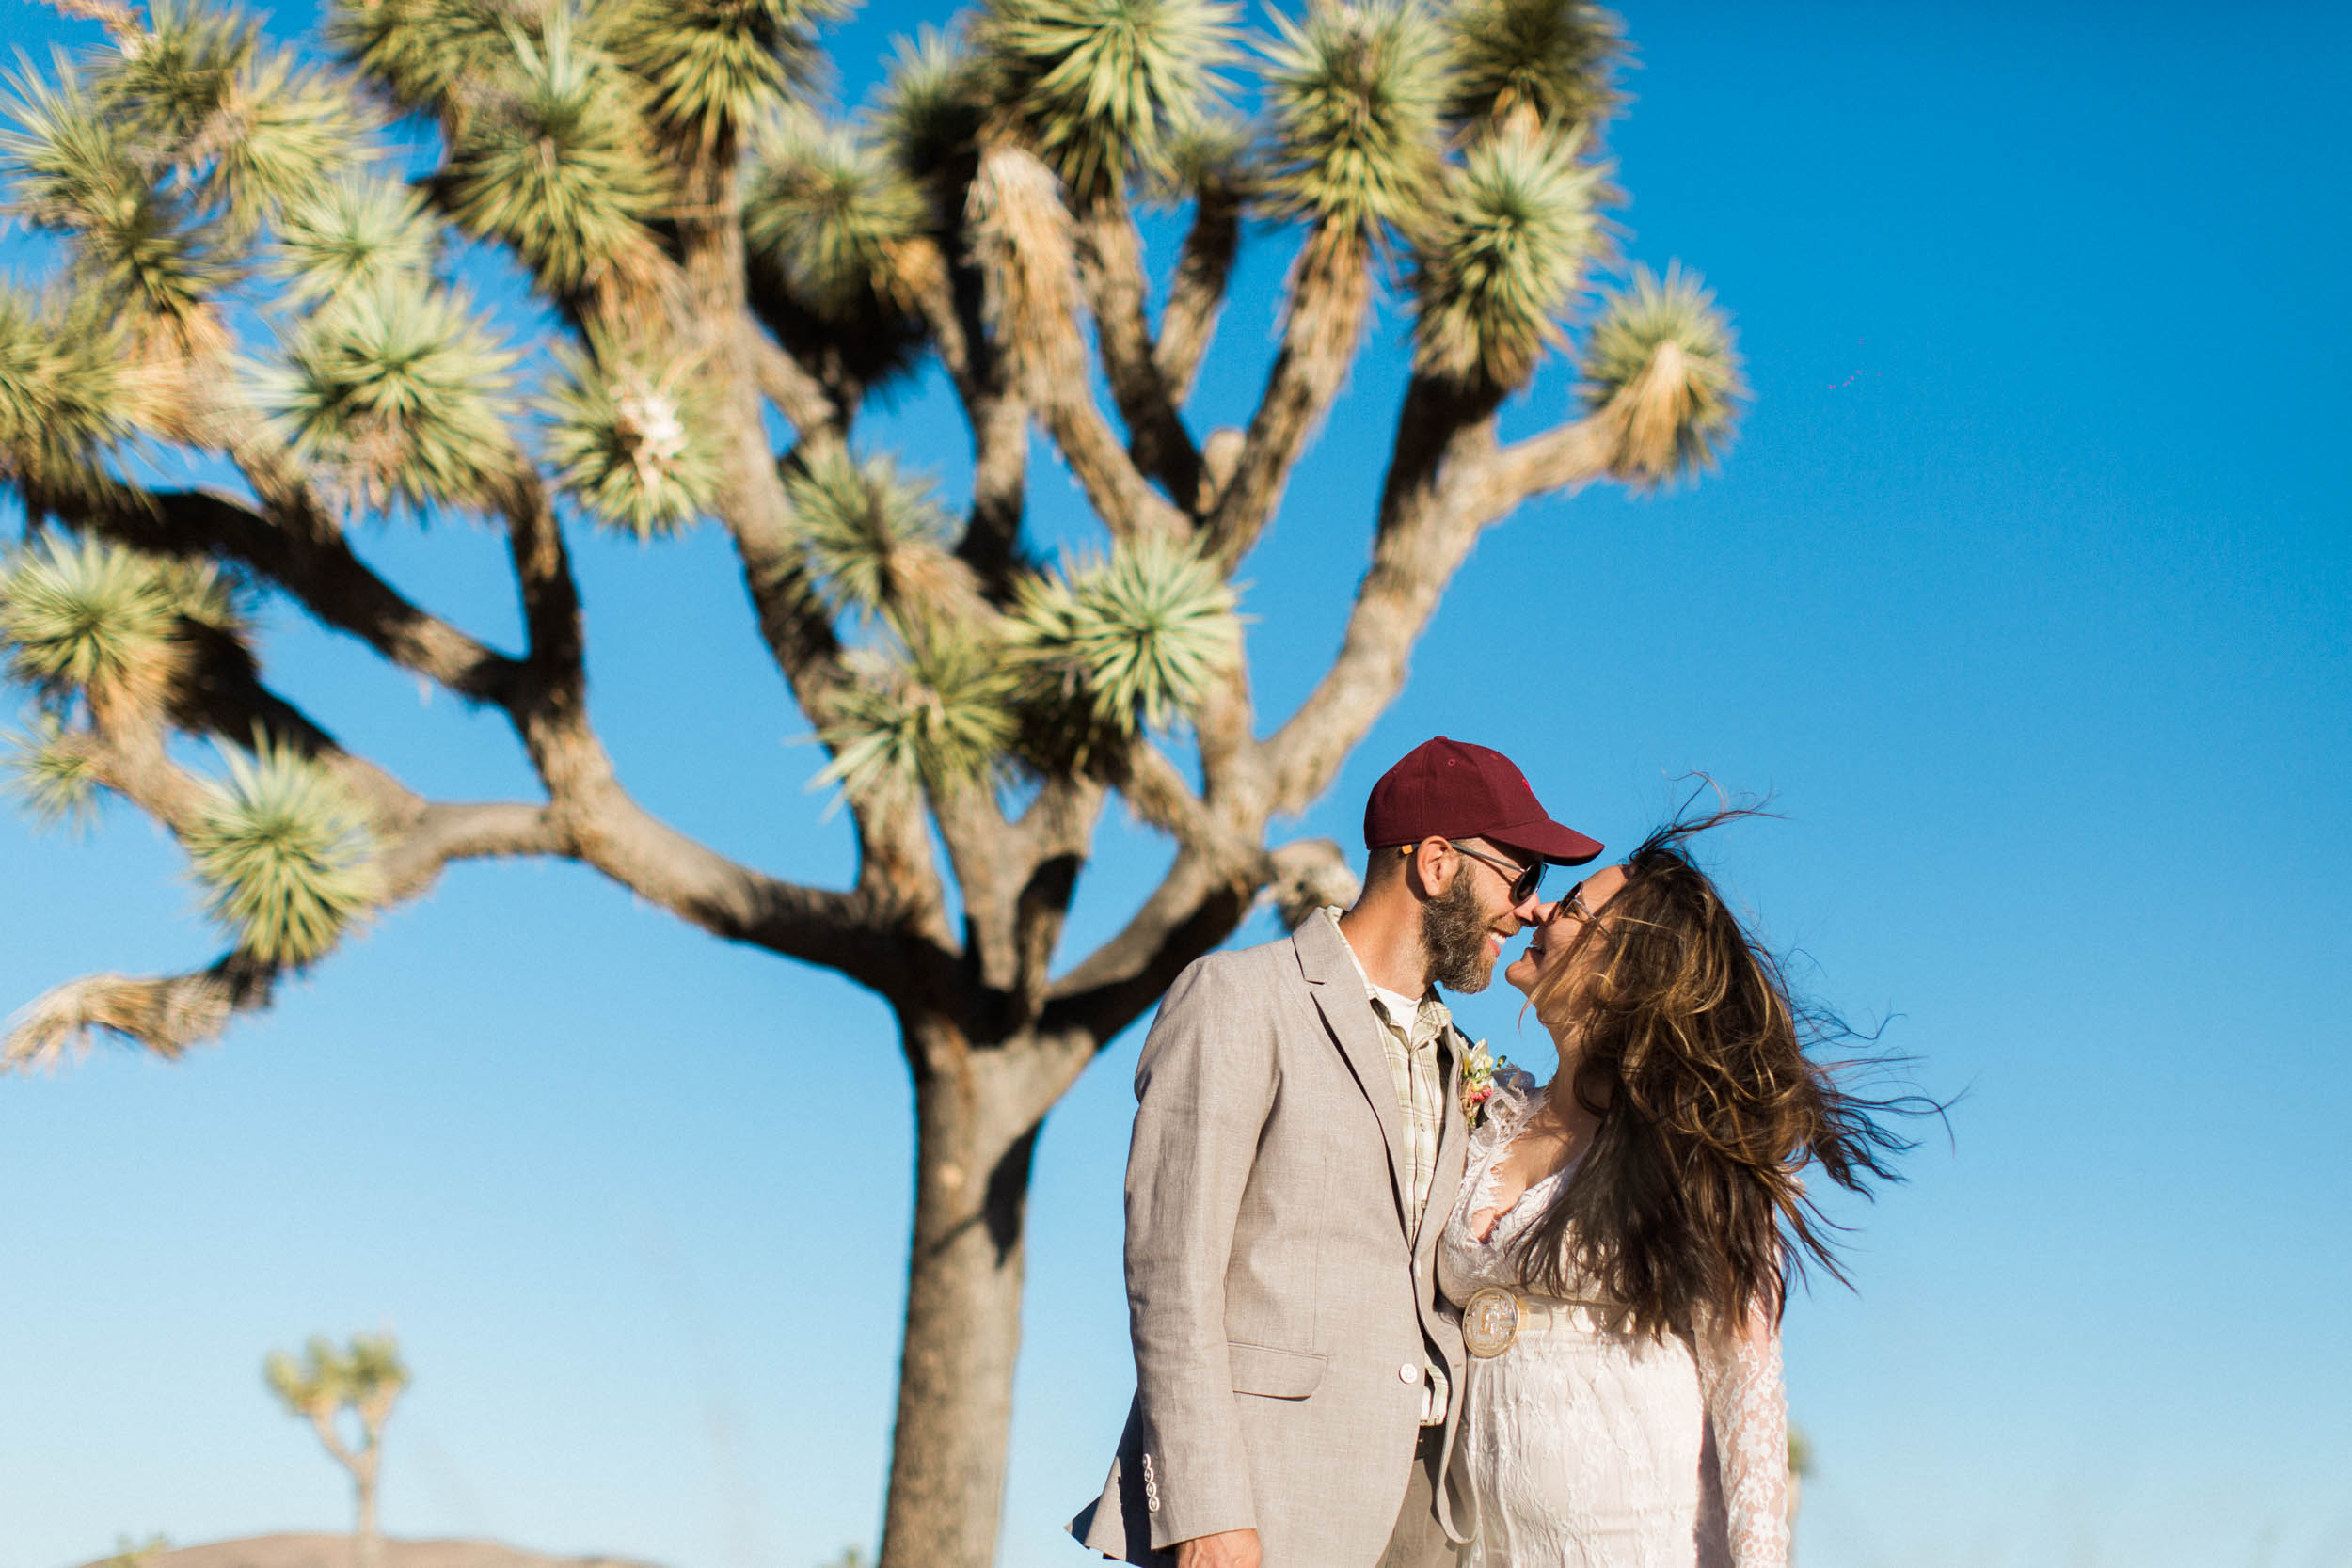 BKM-Photography-Joshua-Tree-Desert-Wedding-Elopement-0036.jpg